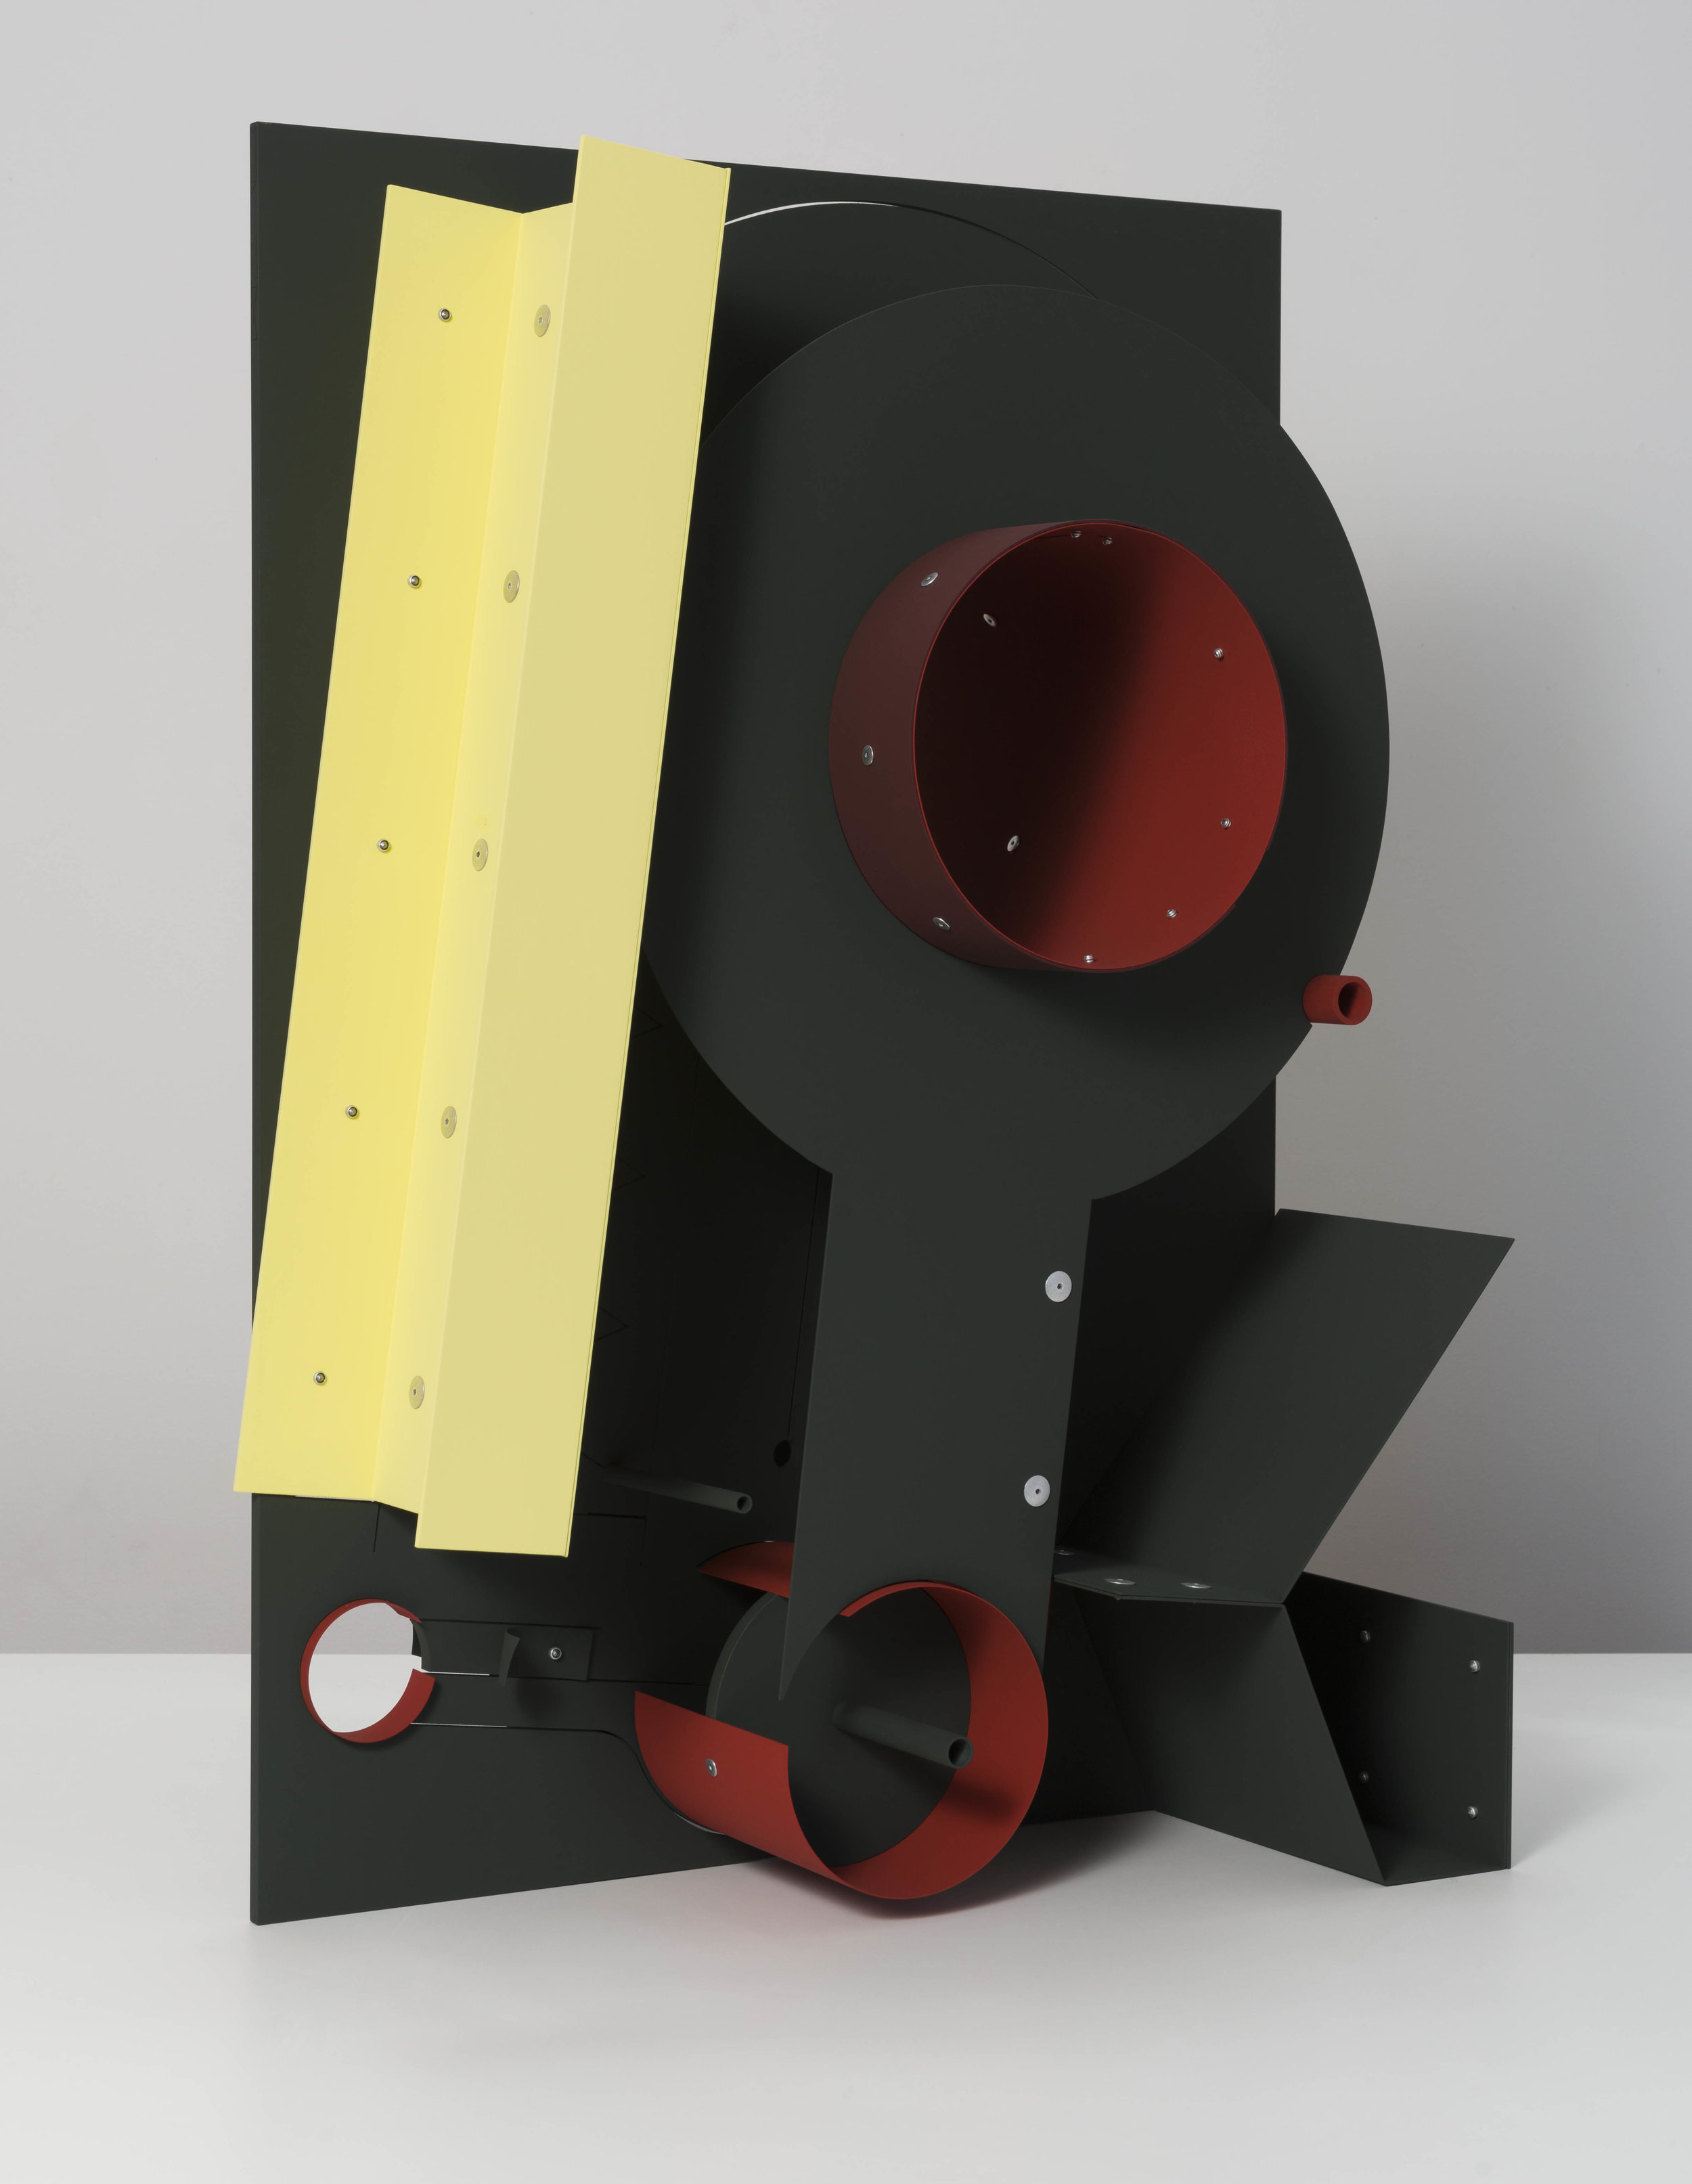 Matt Paweski,  Look out , 2019, aluminum, aluminum rivets, vinyl paint, 36 × 24 ½ × 18 inches (91.4 × 62.2 × 45.7 cm)